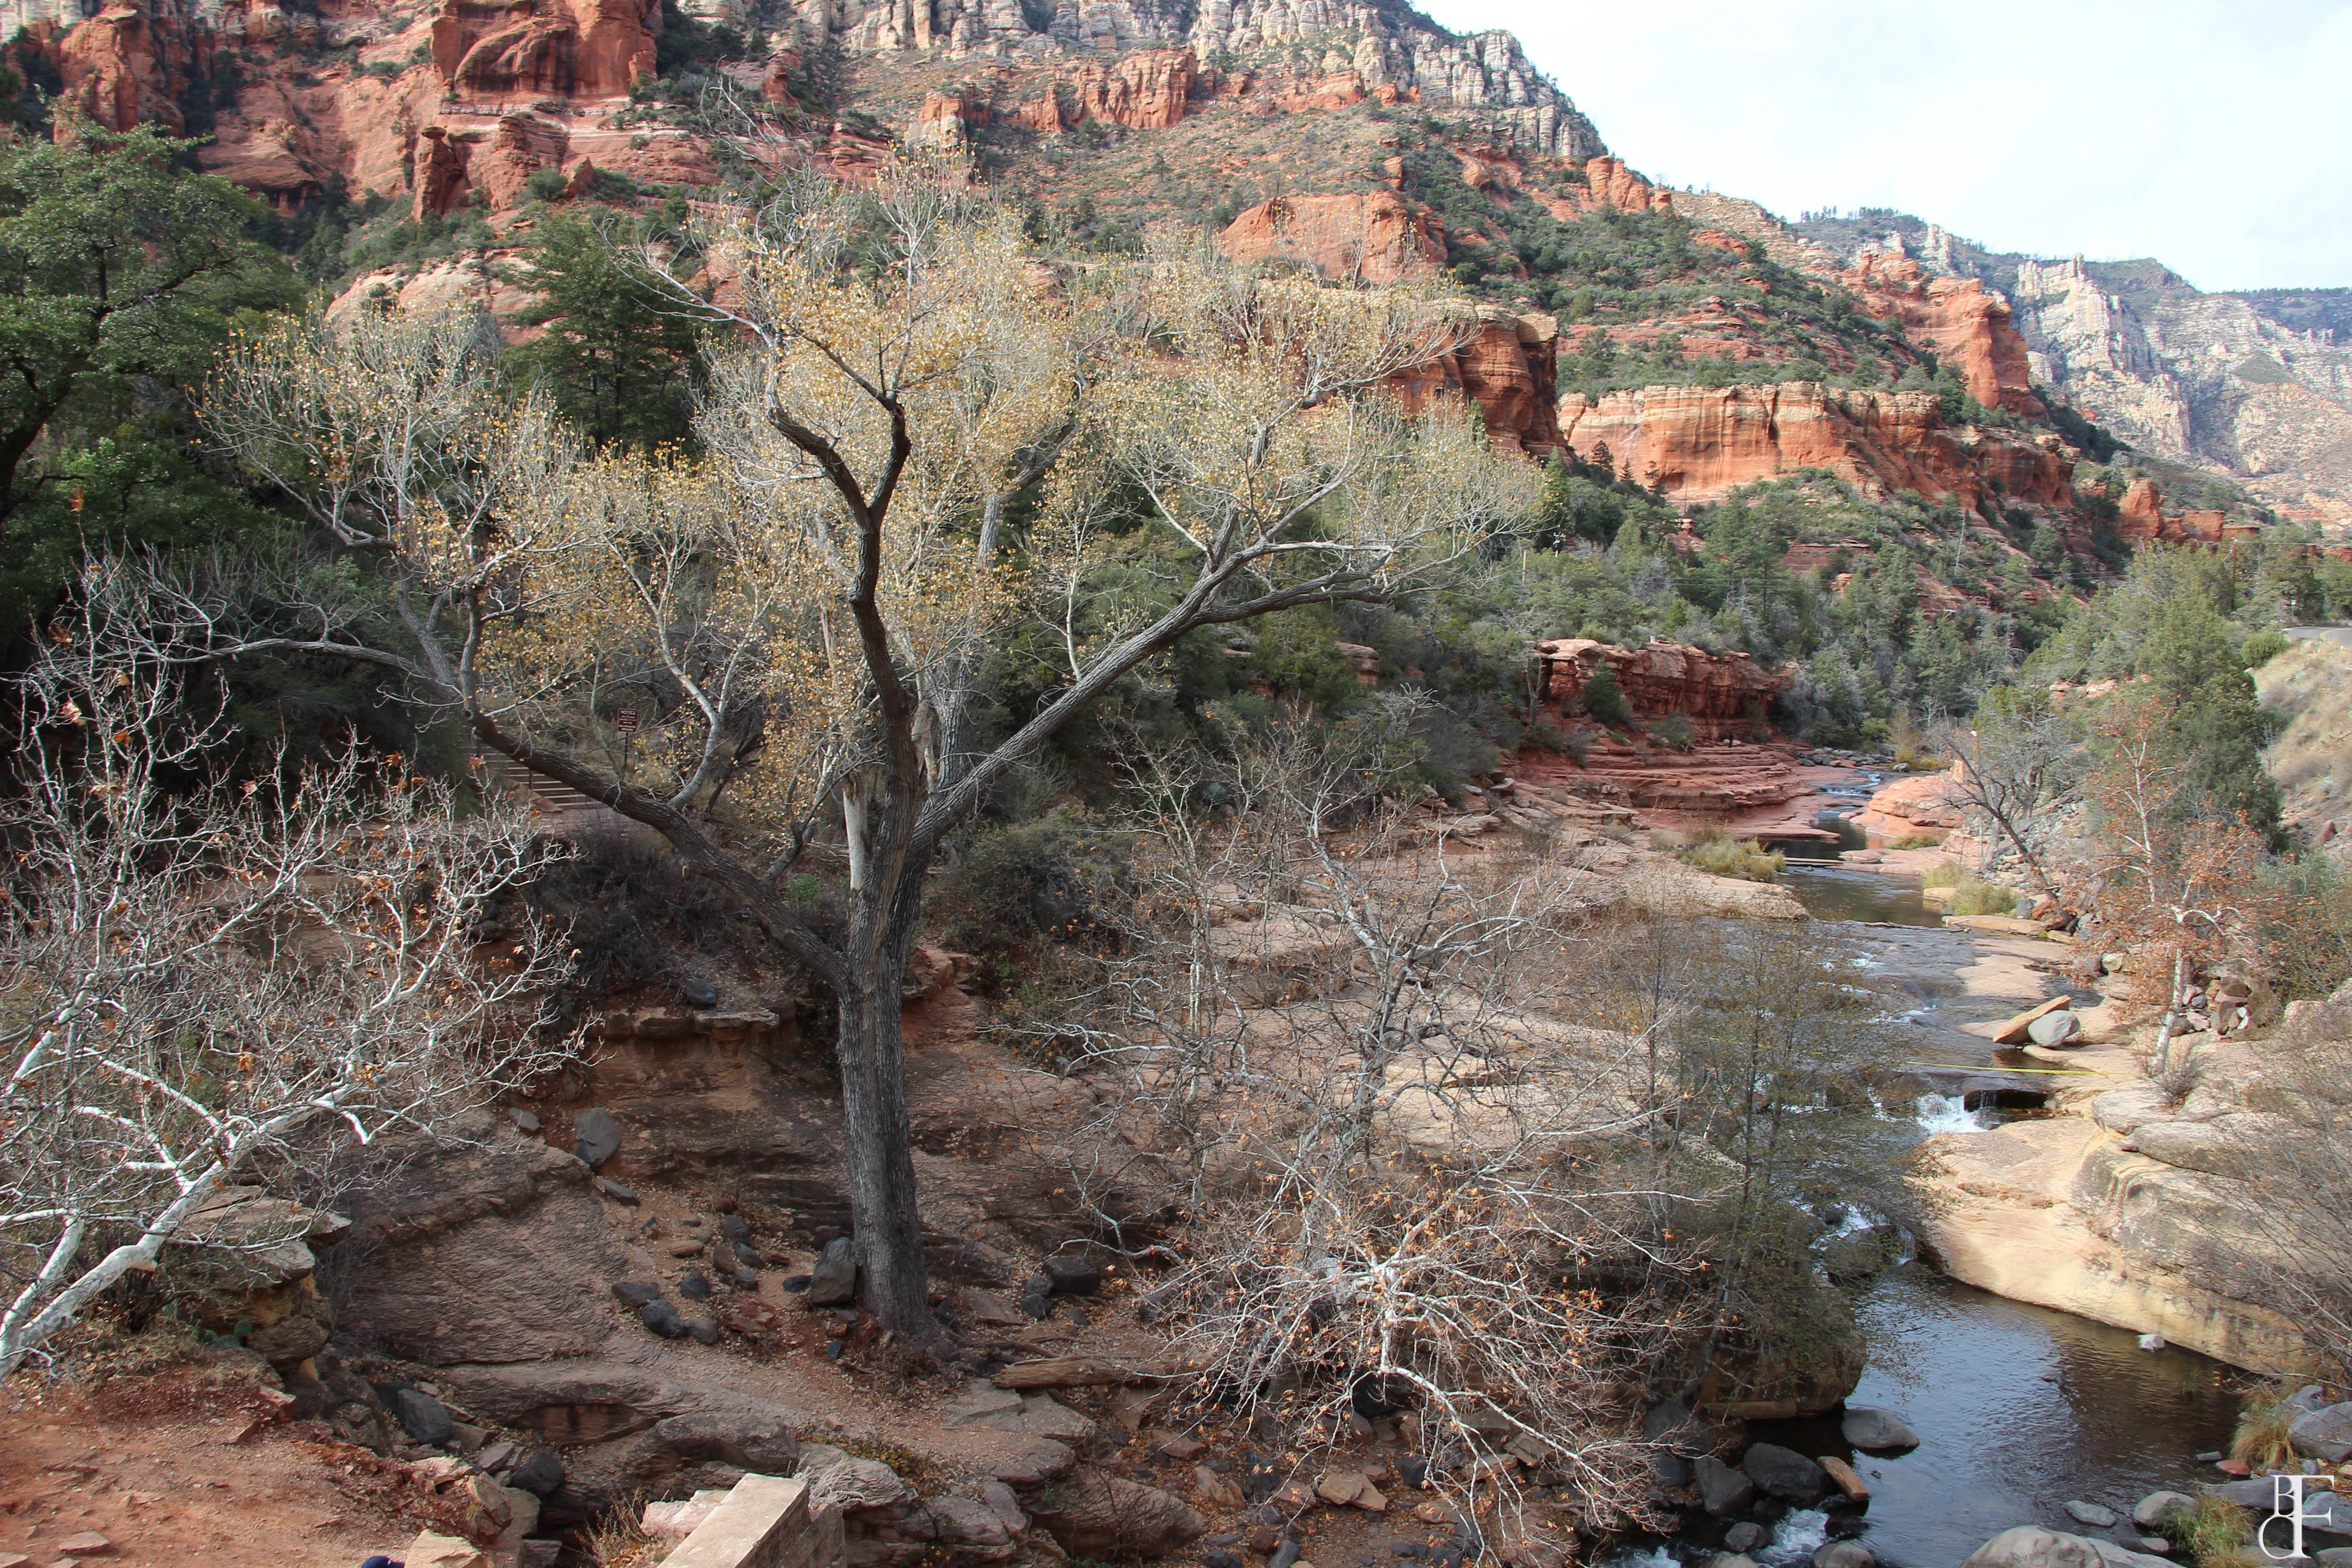 Oak Creek Canyon Arizona [5184x3456] [OC]